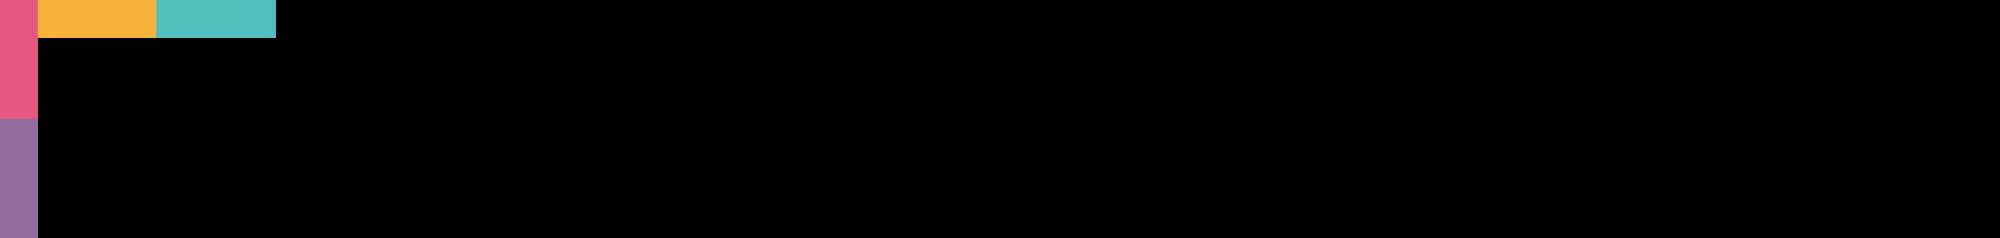 Social Change Central_Logo_Primary